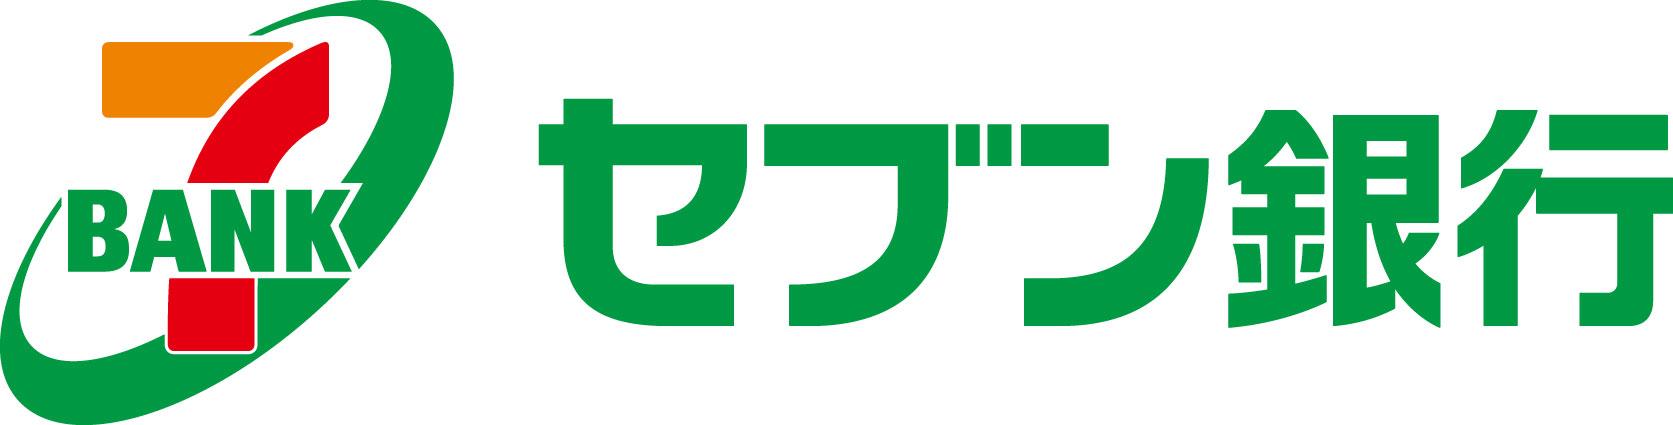 7BANK セブン銀行